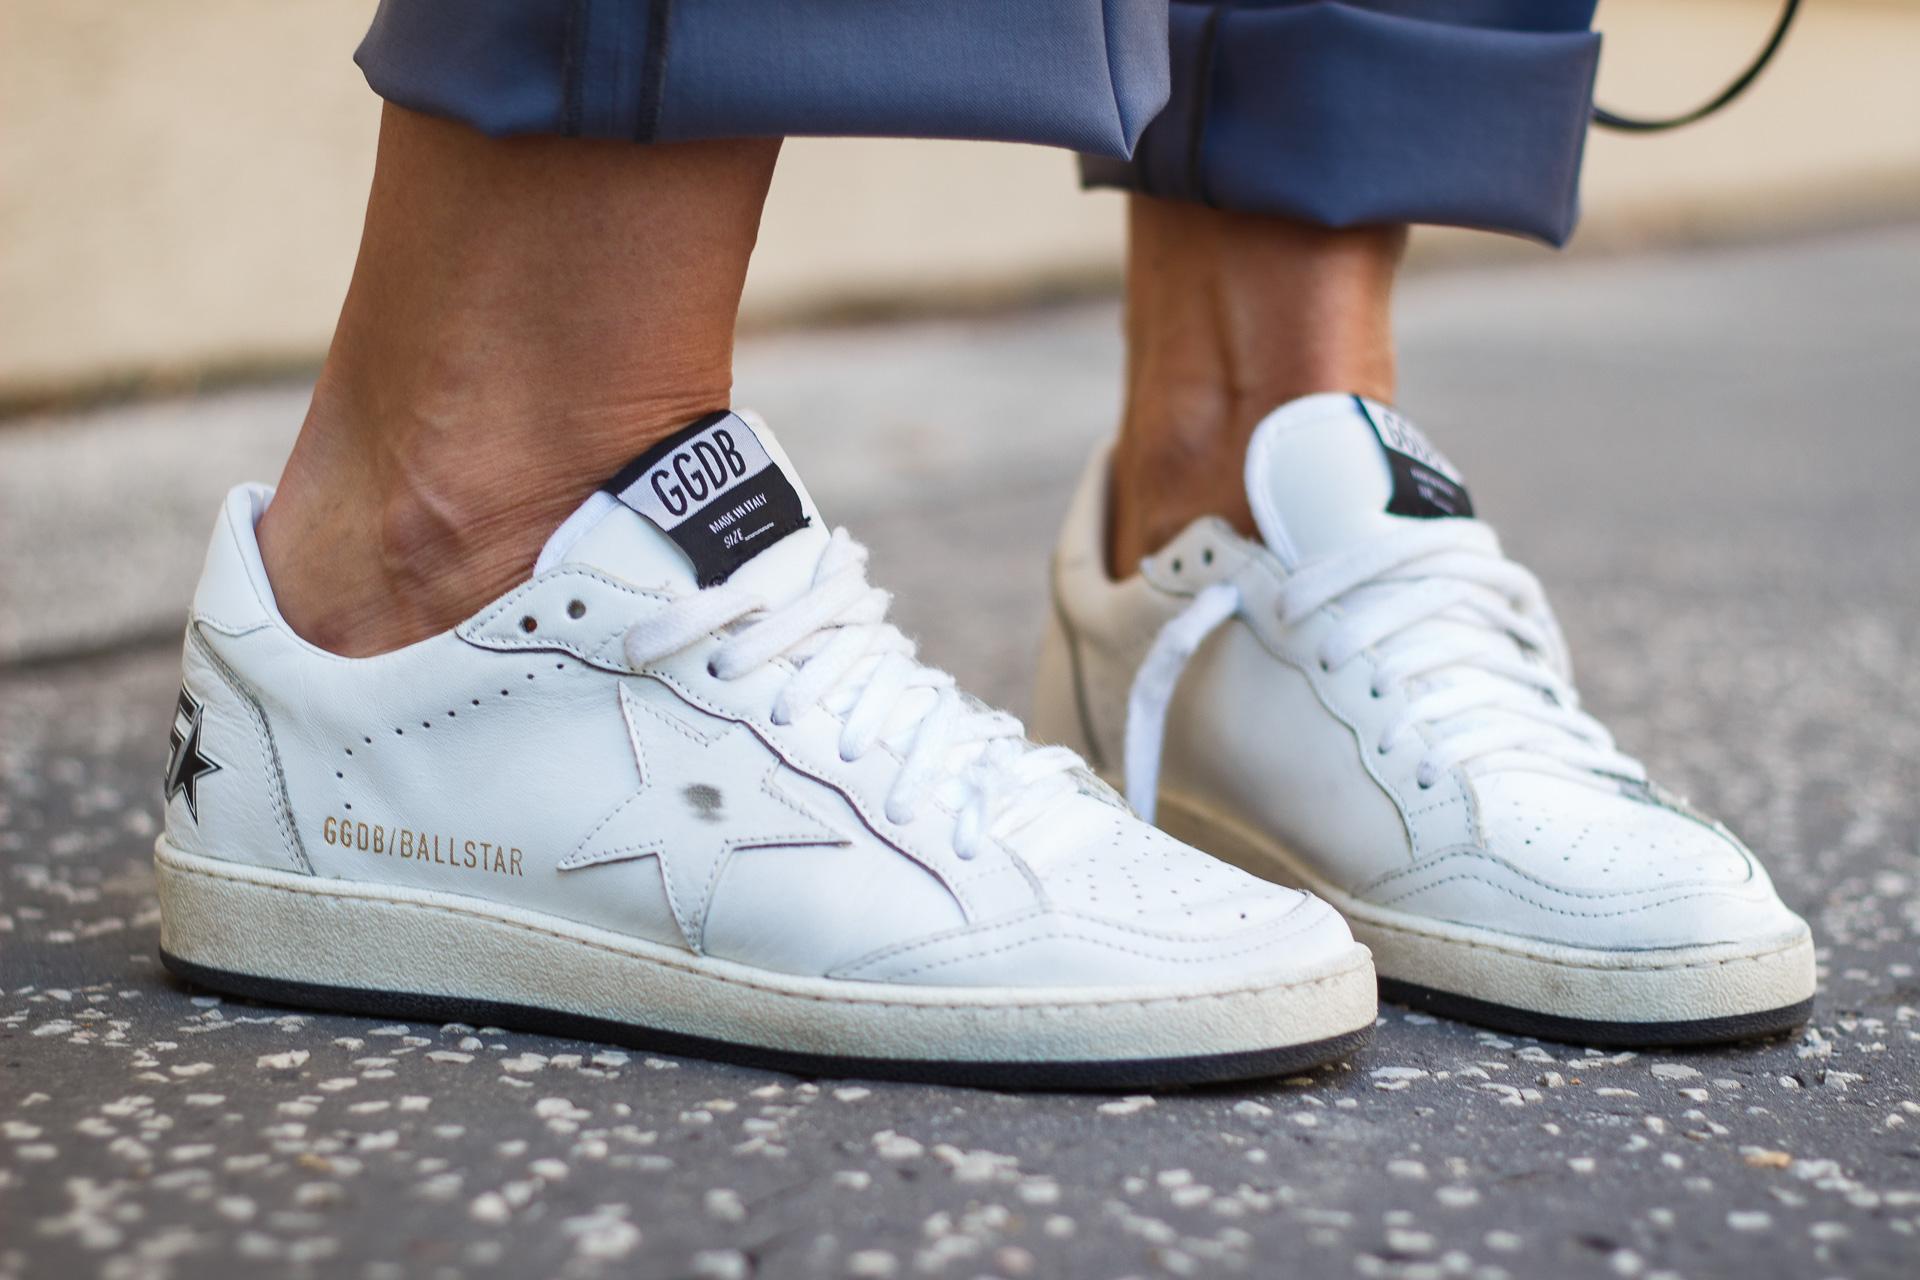 Golden Goose Deluxe Brand White Star Sneakers